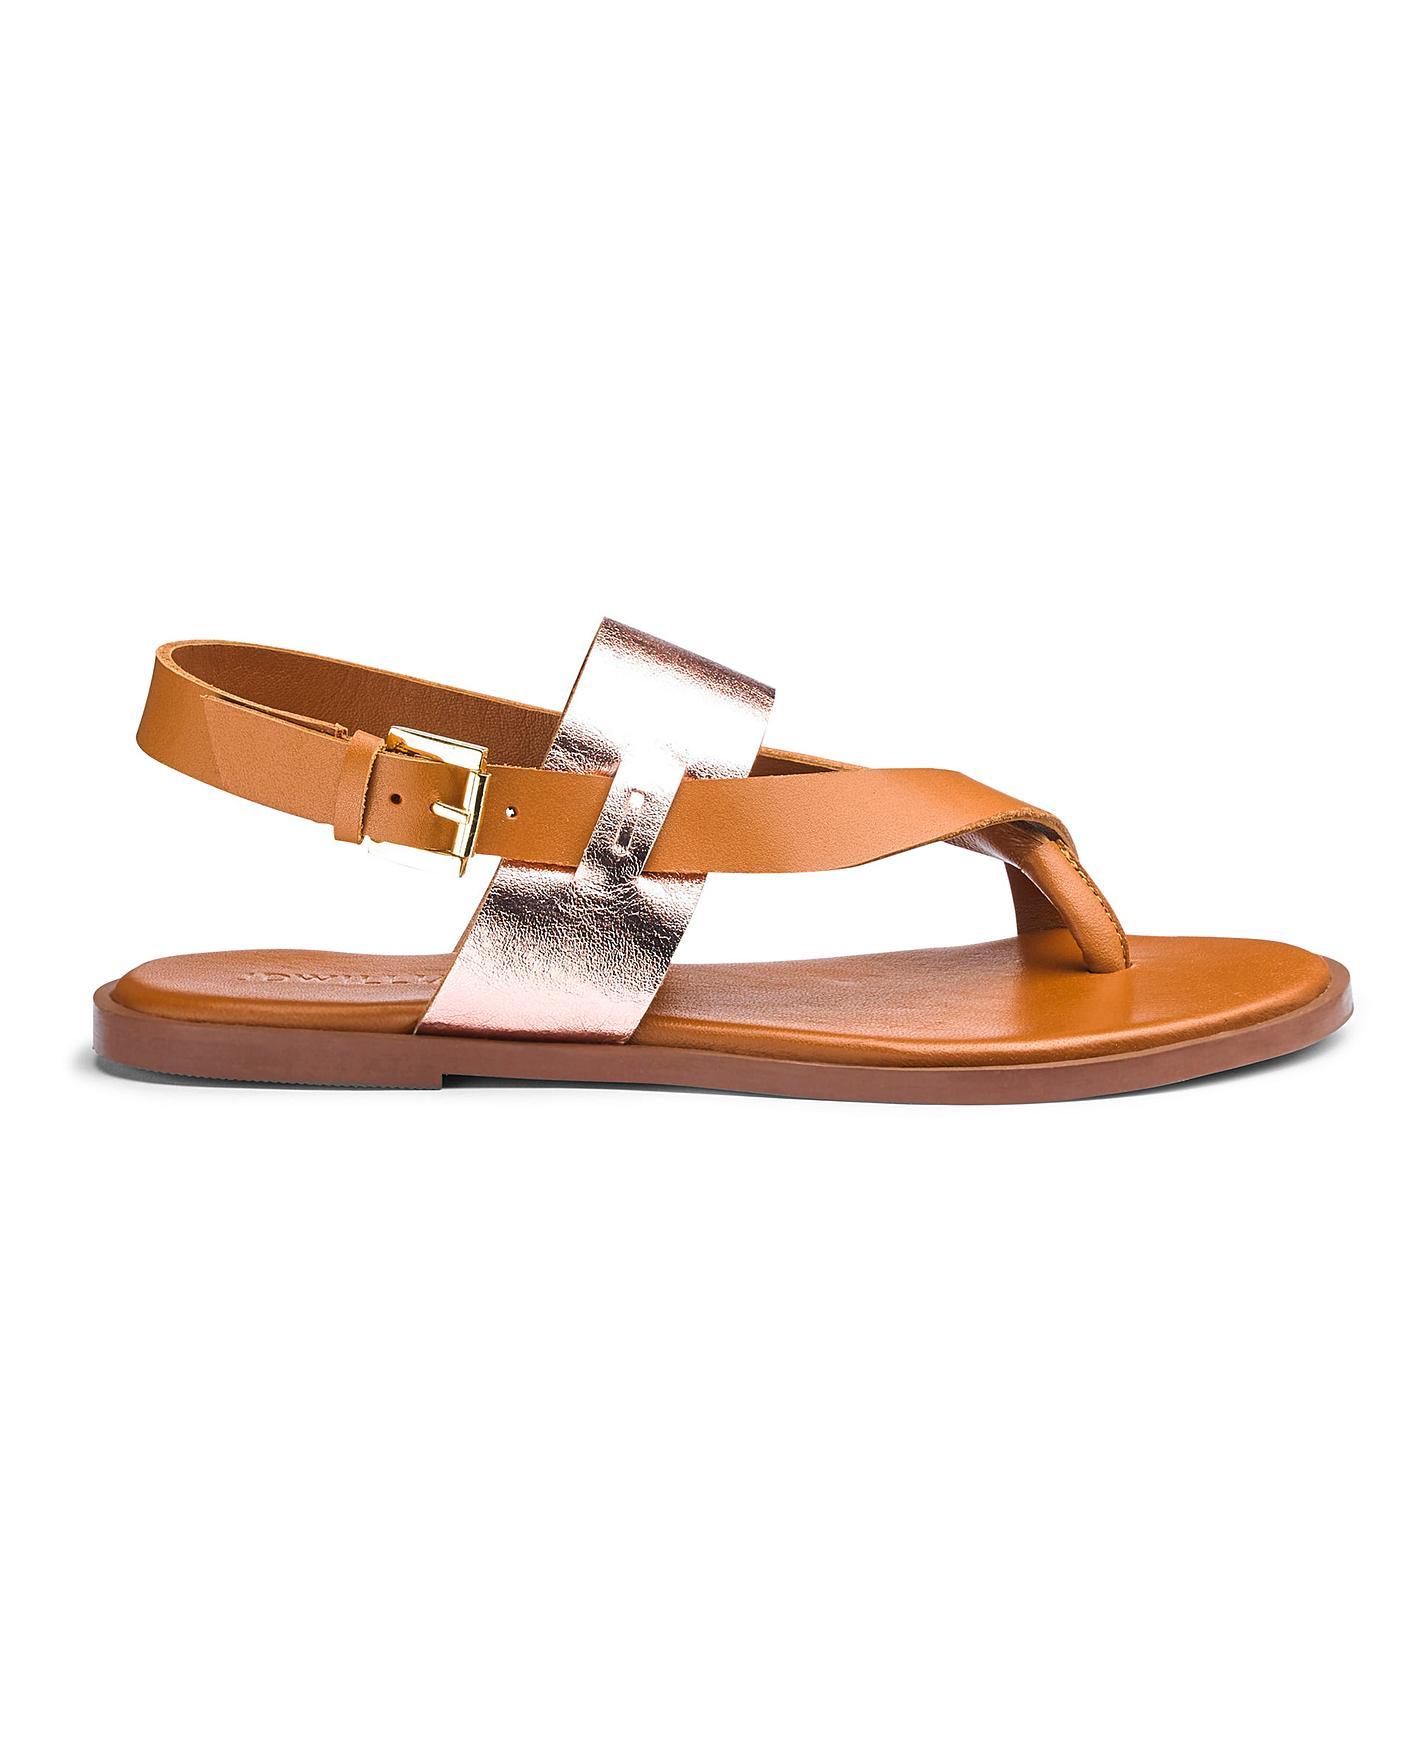 Leather Toe Post Sandals E Fit | Marisota